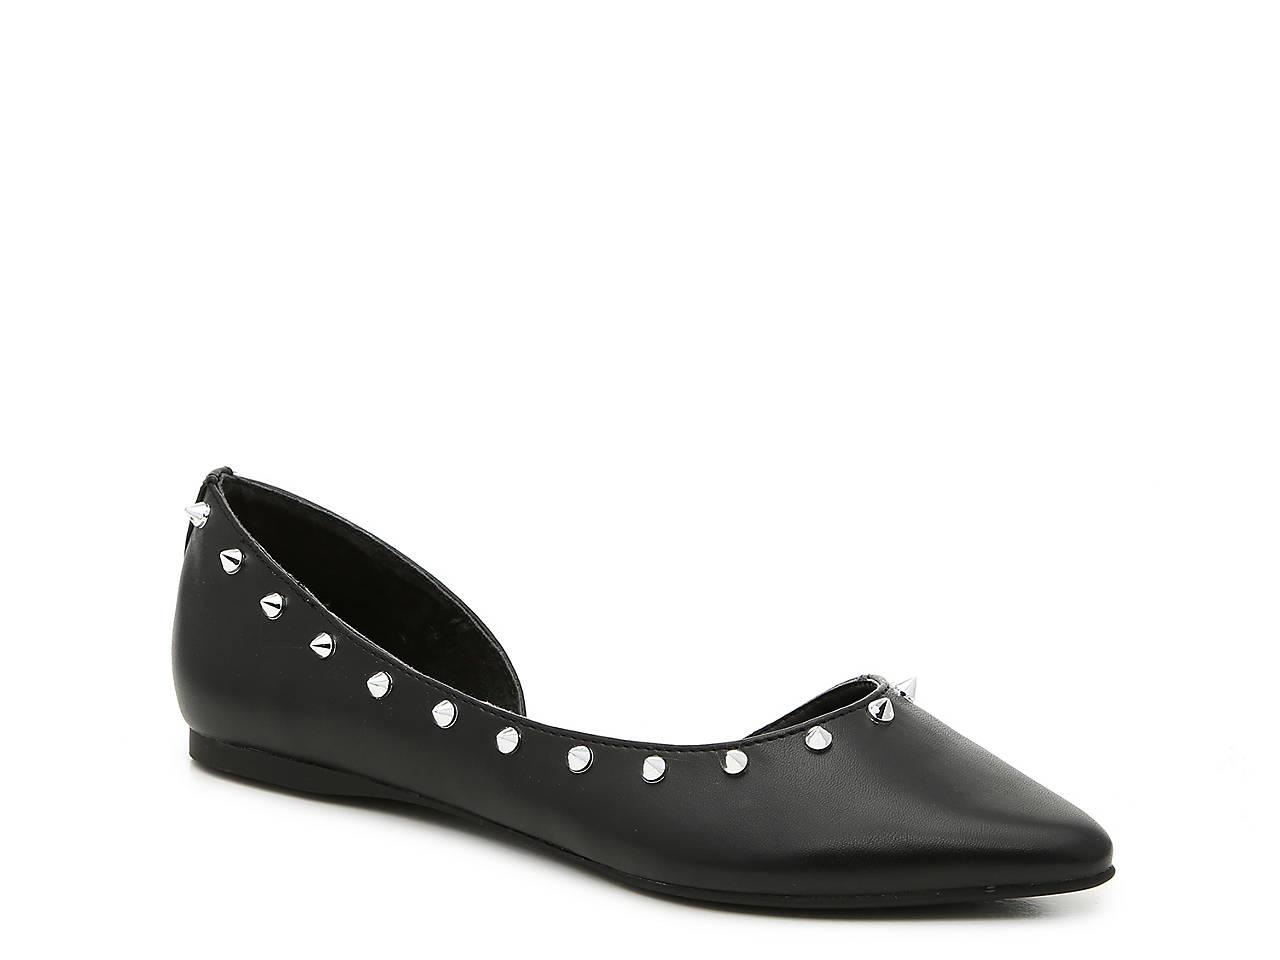 cb5ad1e8797 Steve Madden Empress Flat Men s Shoes